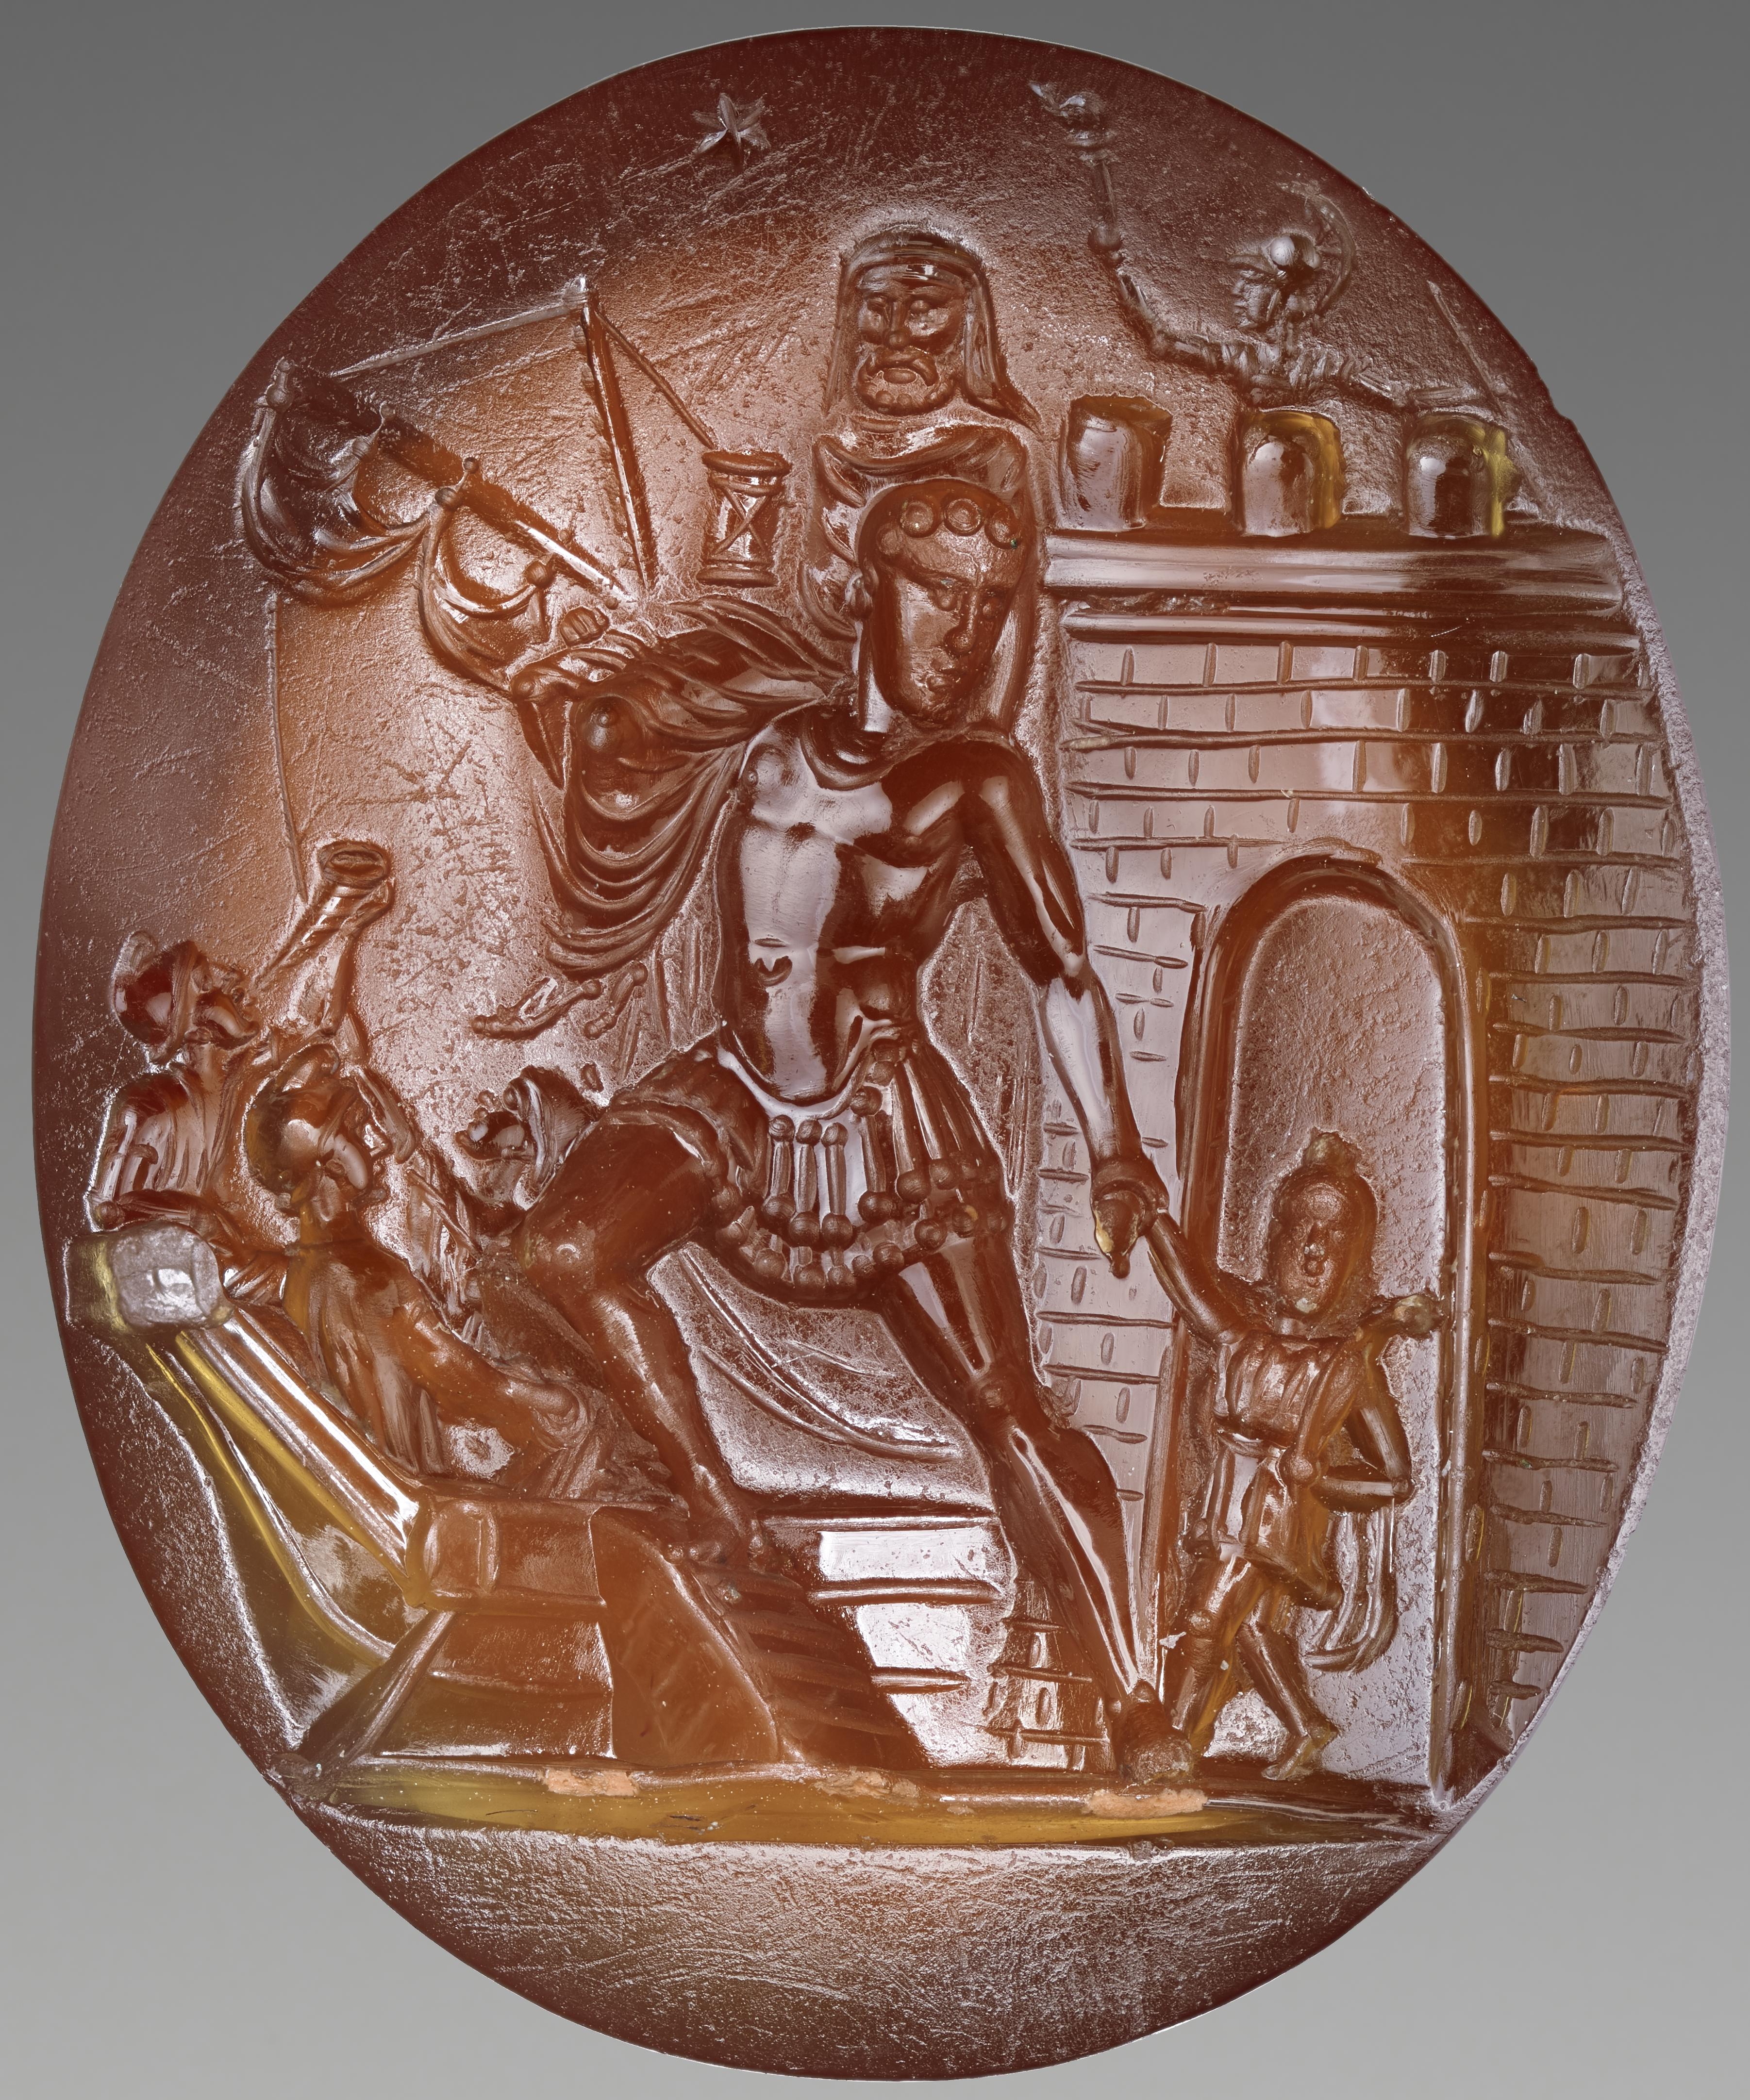 The Getty's stunning Aeneas intaglio